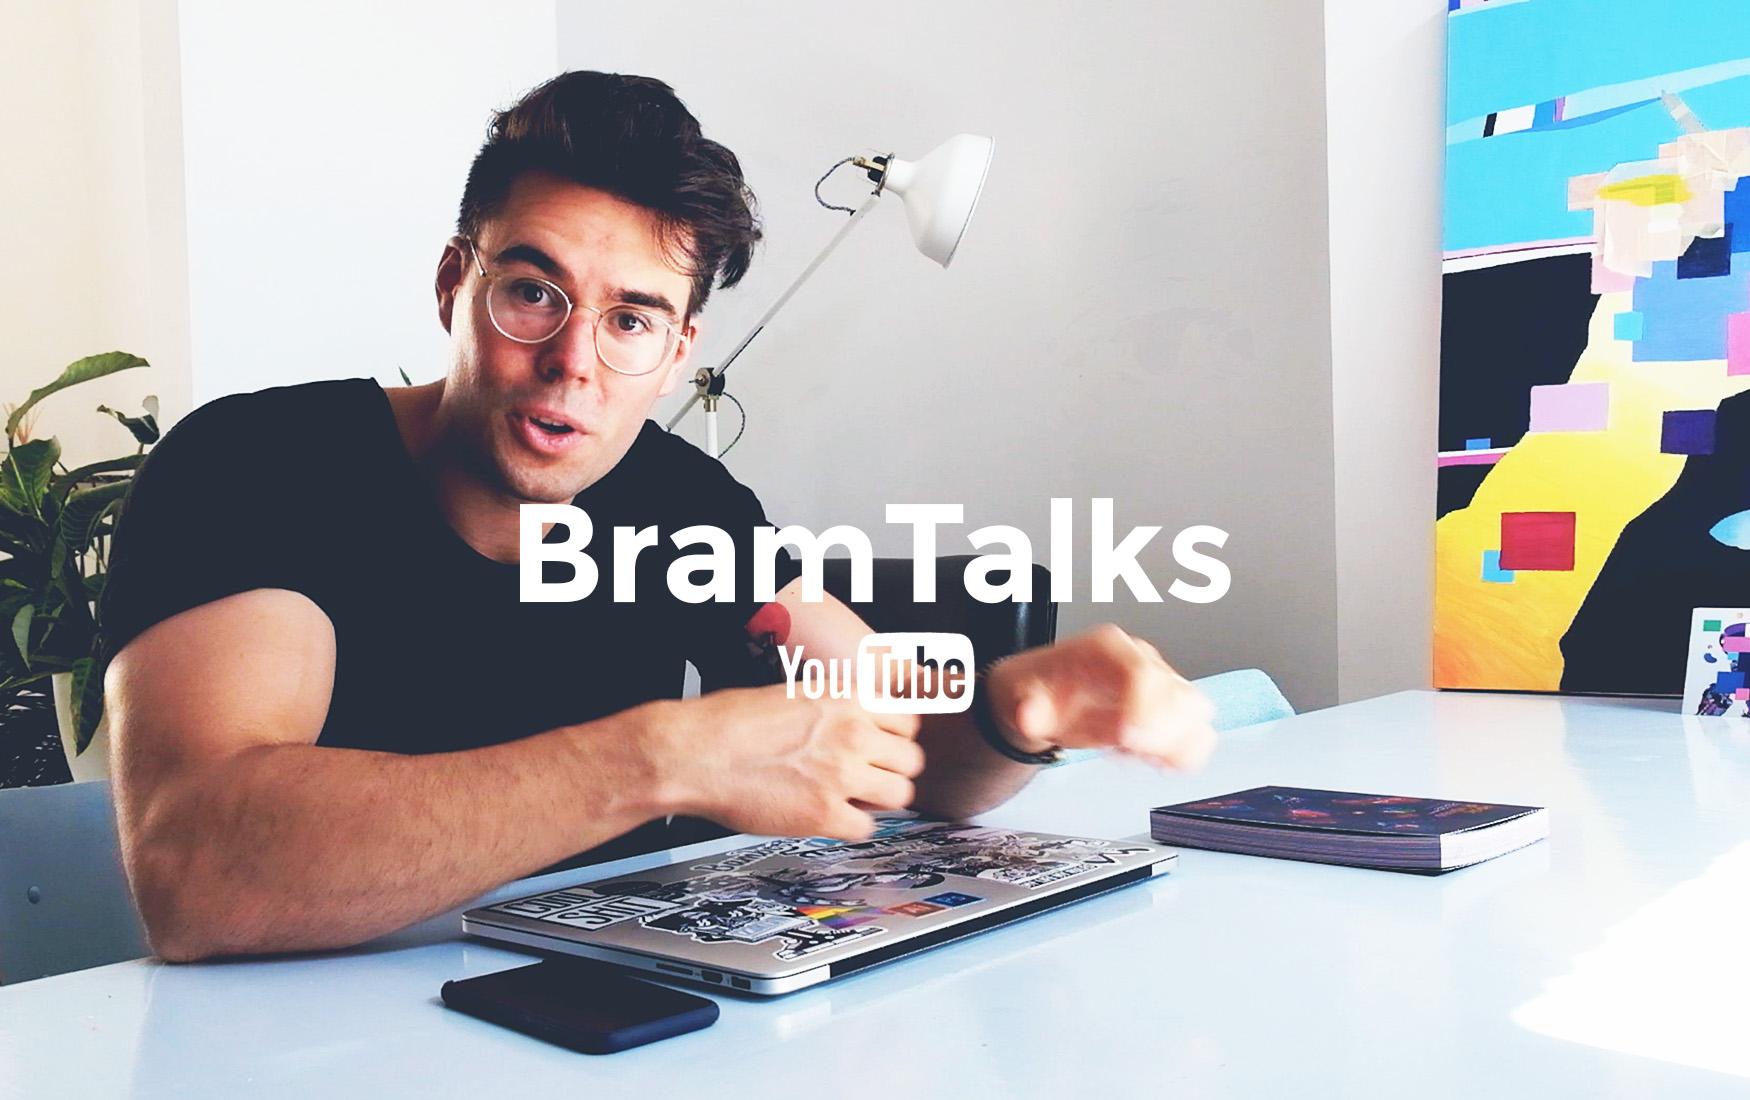 BramTalks